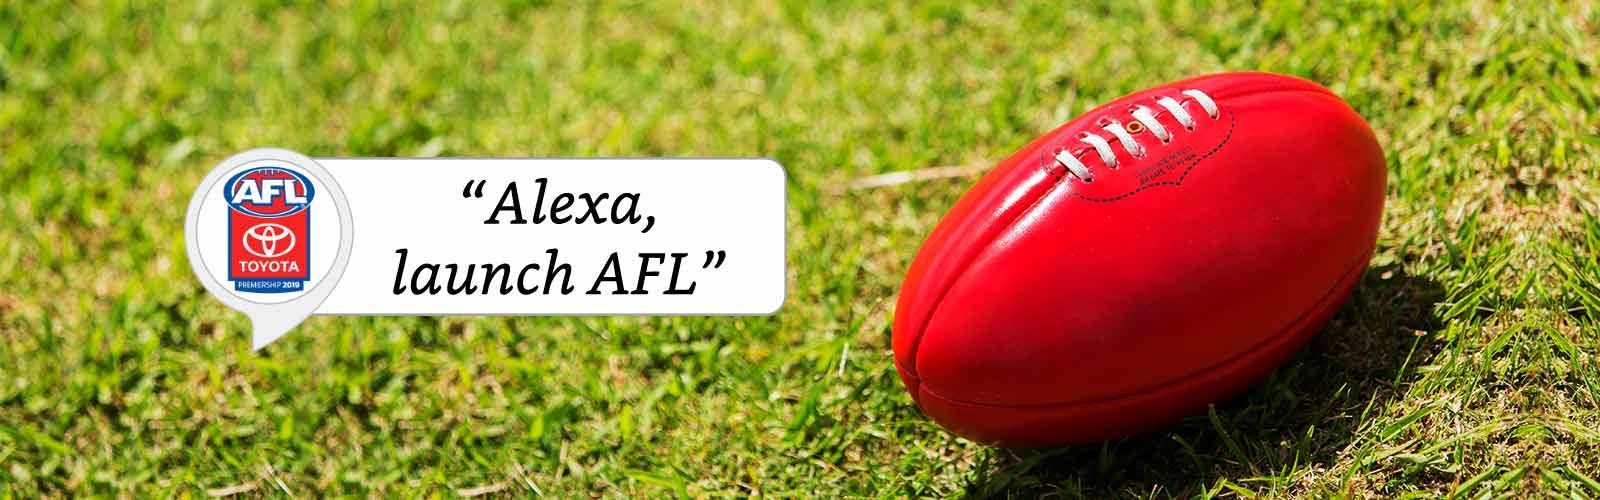 """Alexa, launch AFL"""